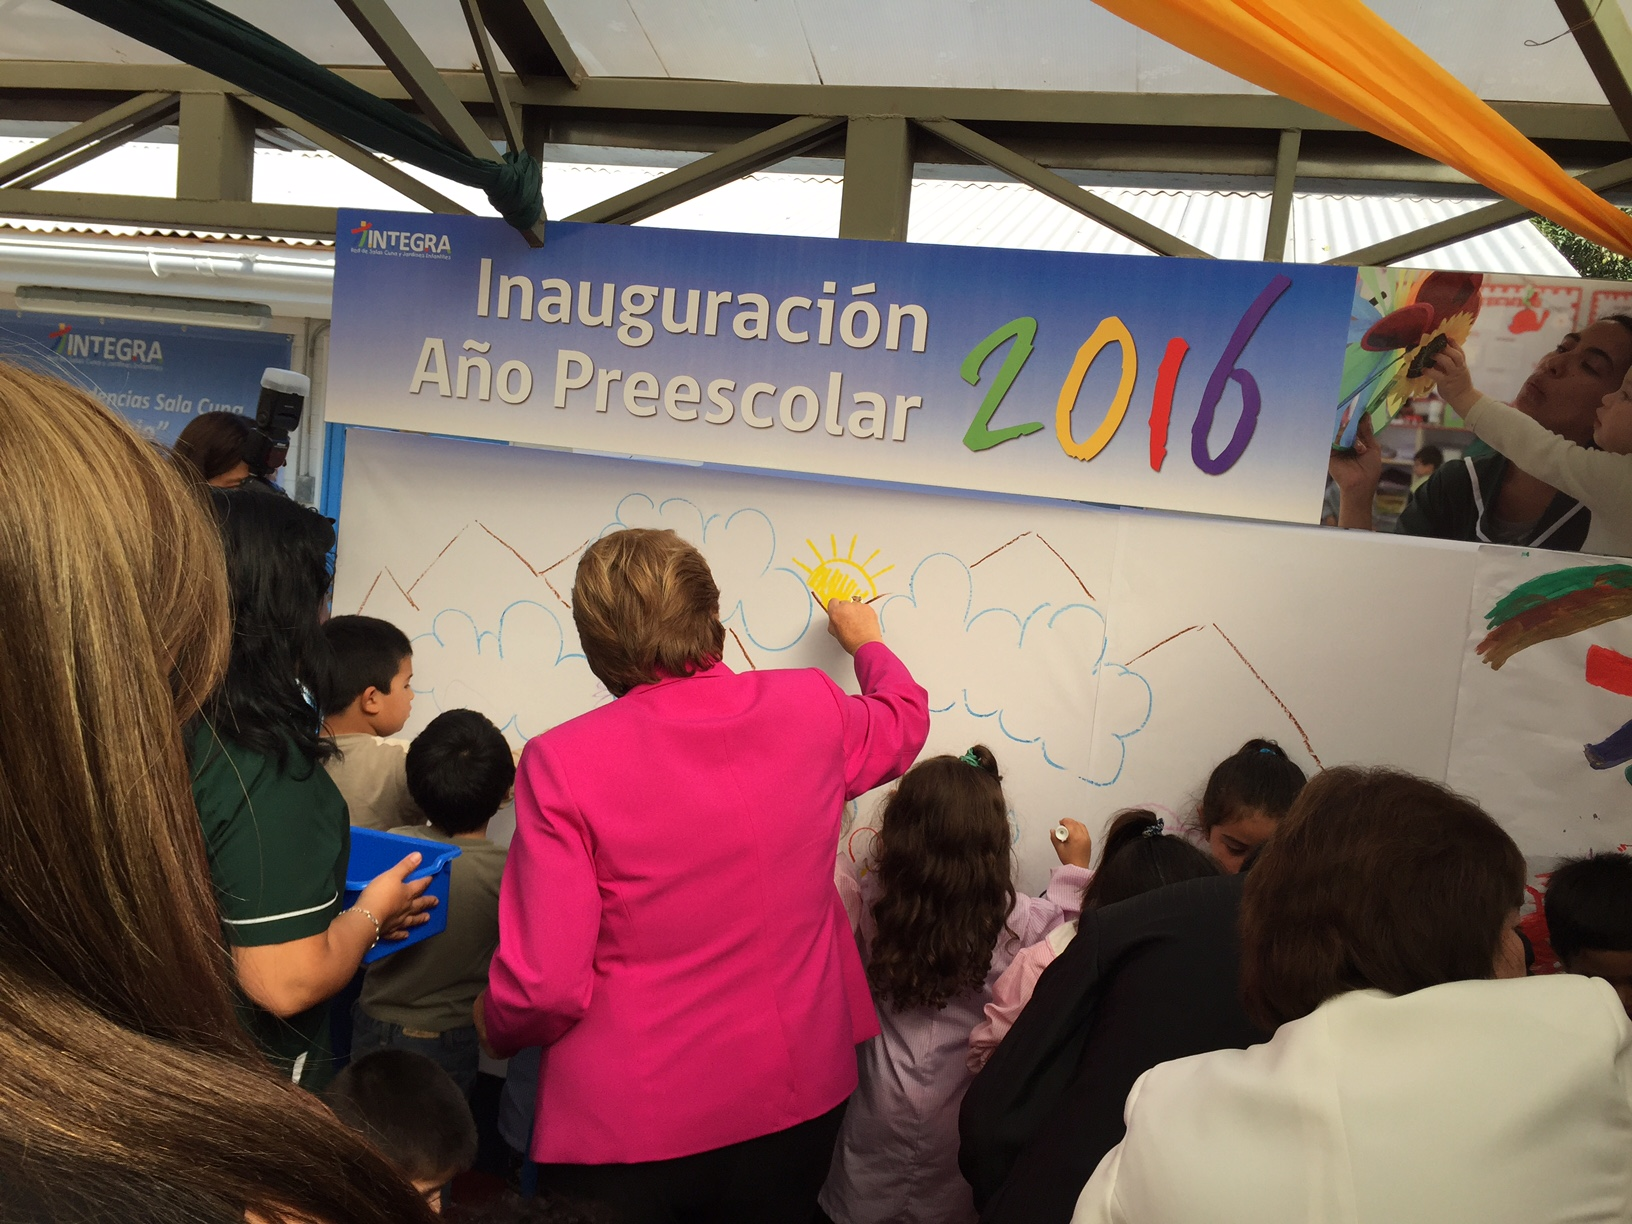 Presidenta inaugura jardin el refugio